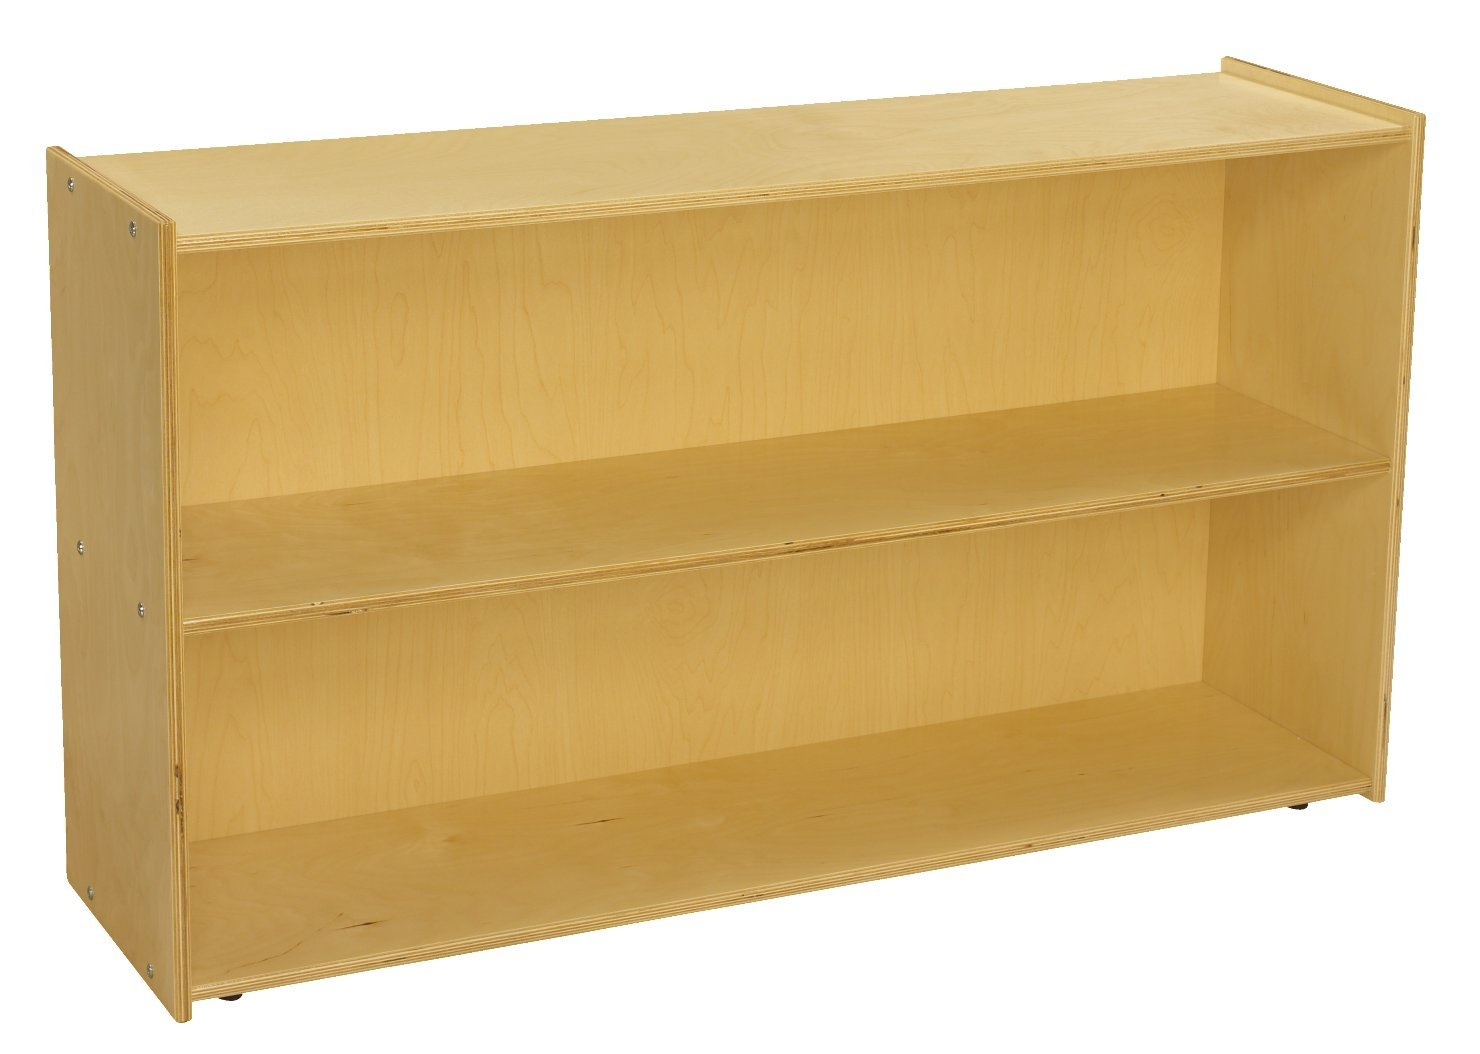 Childcraft 1526296 ABC Furnishings 2-Shelf Storage Unit, 27.38'' Height, 13'' Width, 48'' Length, Natural Wood